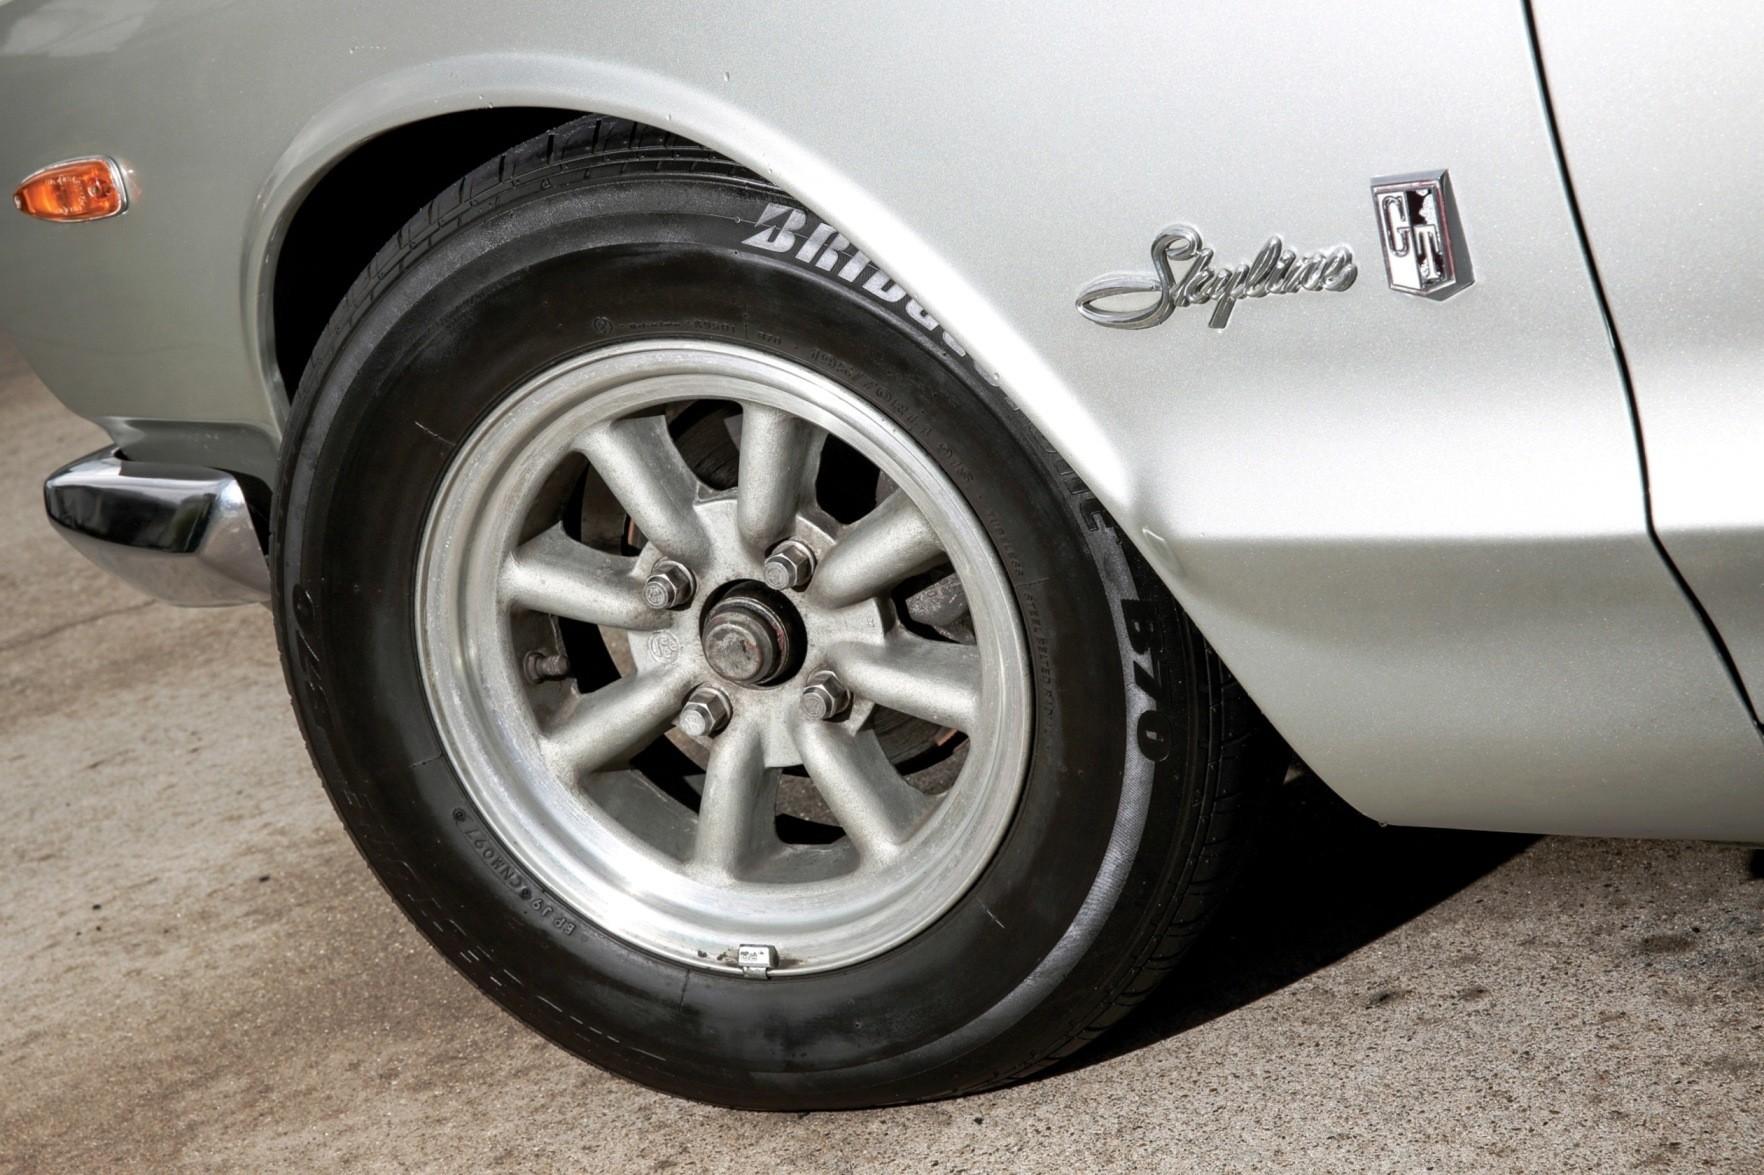 RM Monterey 2014 Preview - 1972 Nissan Skyline HT 2000 GT-R Hakosuka